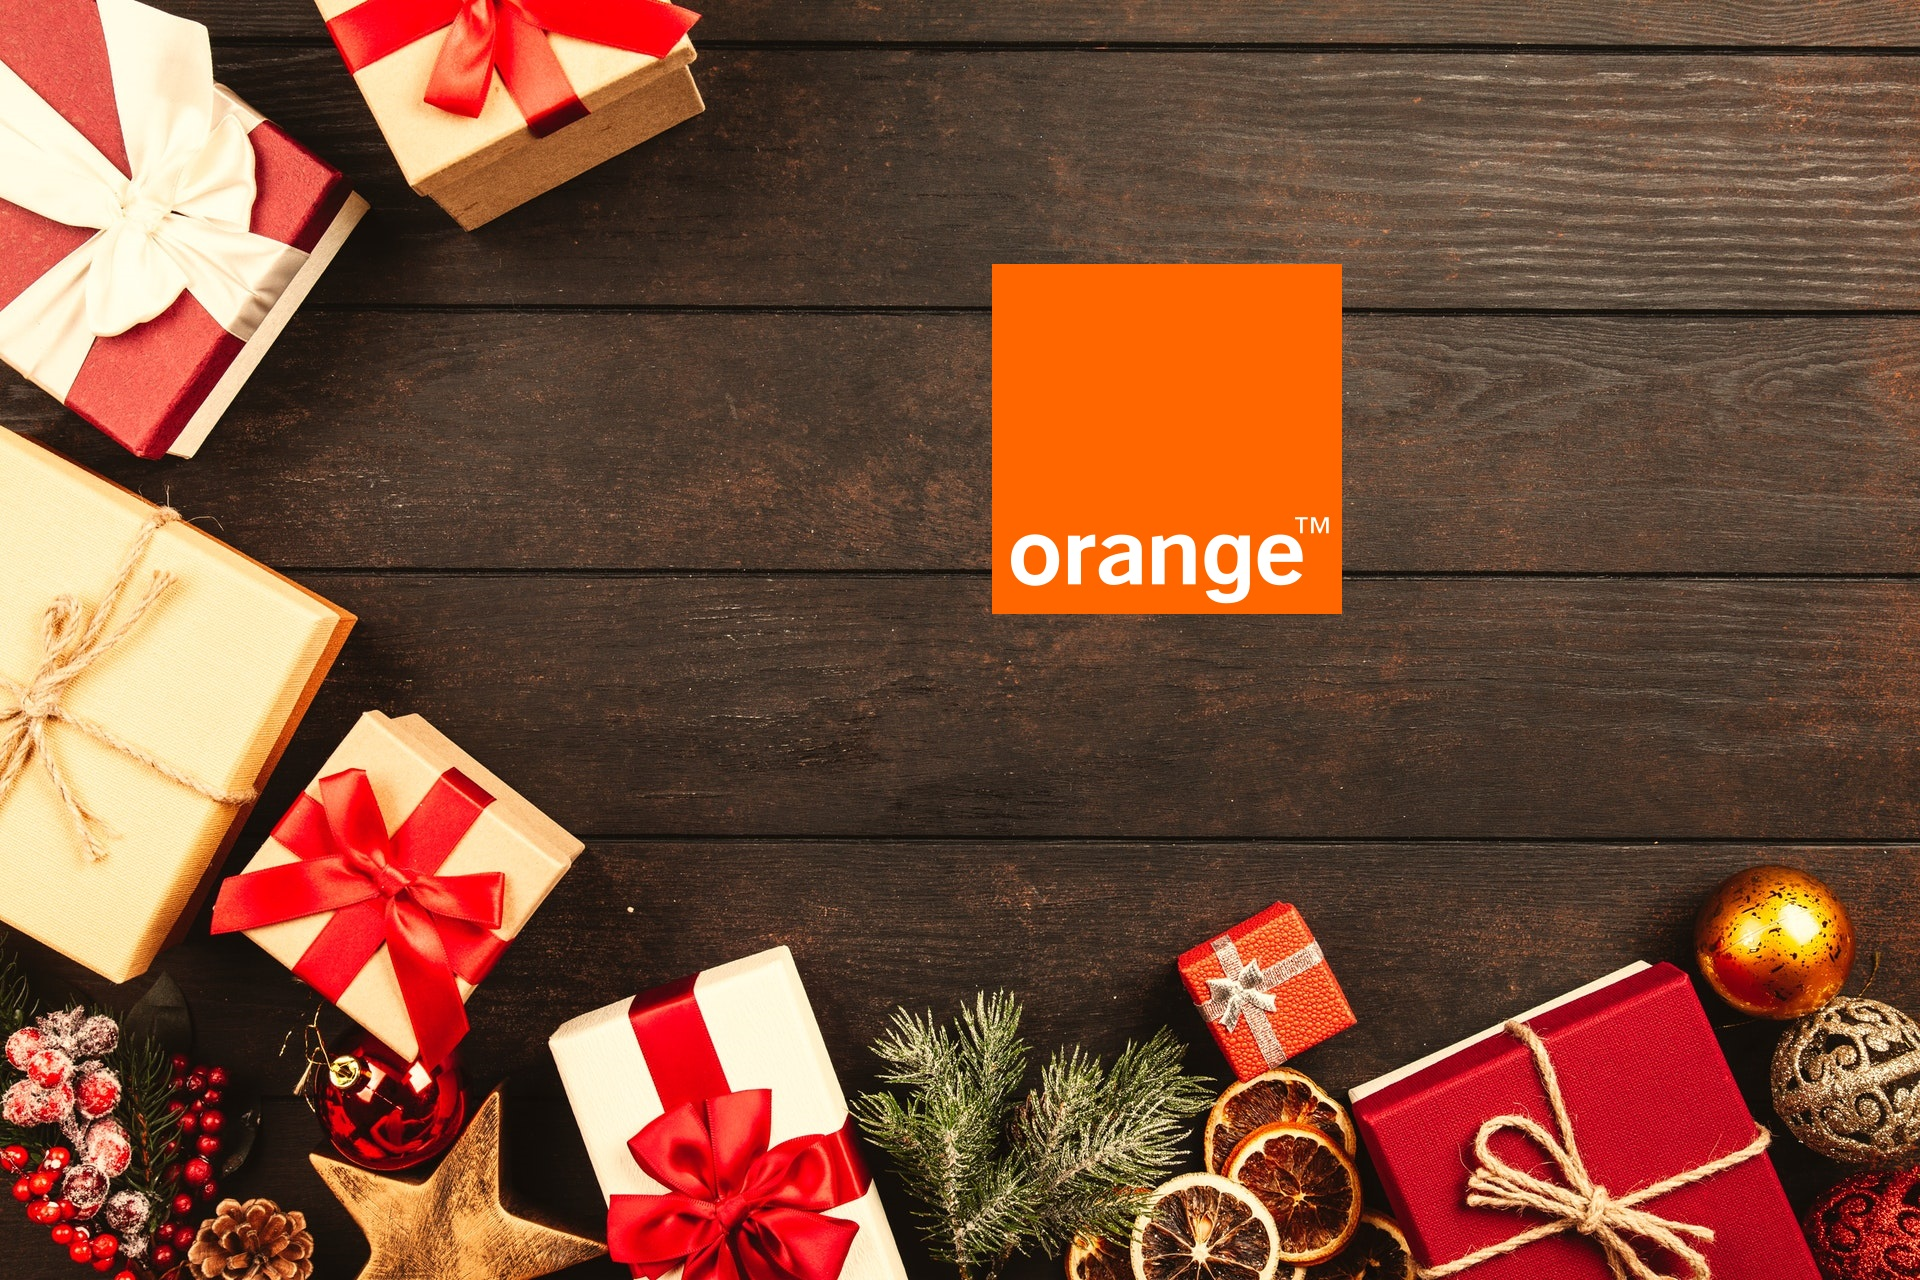 Telewizor i drugi smartfon za złotówkę na święta od Orange 20